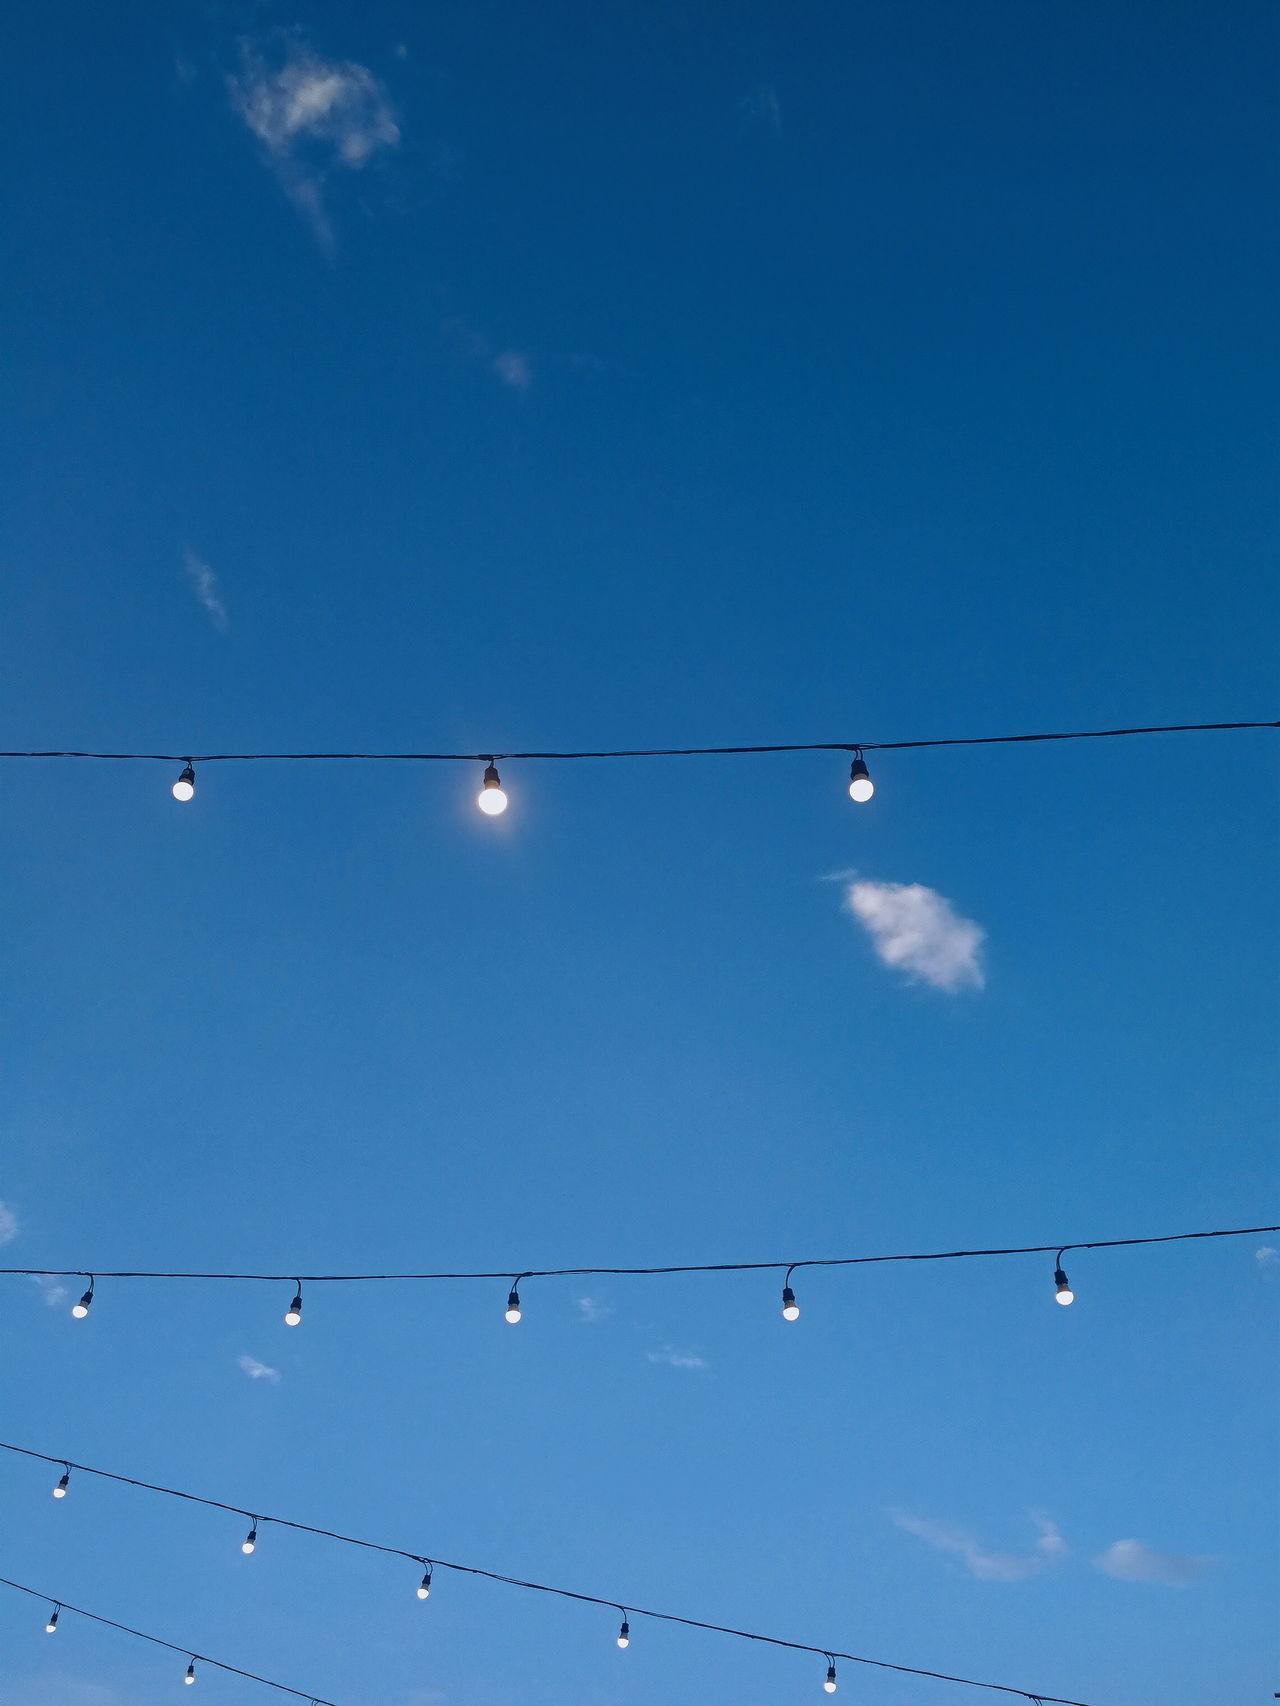 Blue skies Sky Cloud - Sky Blue Nature Outdoors Scenics Beauty In Nature Light Bulbs